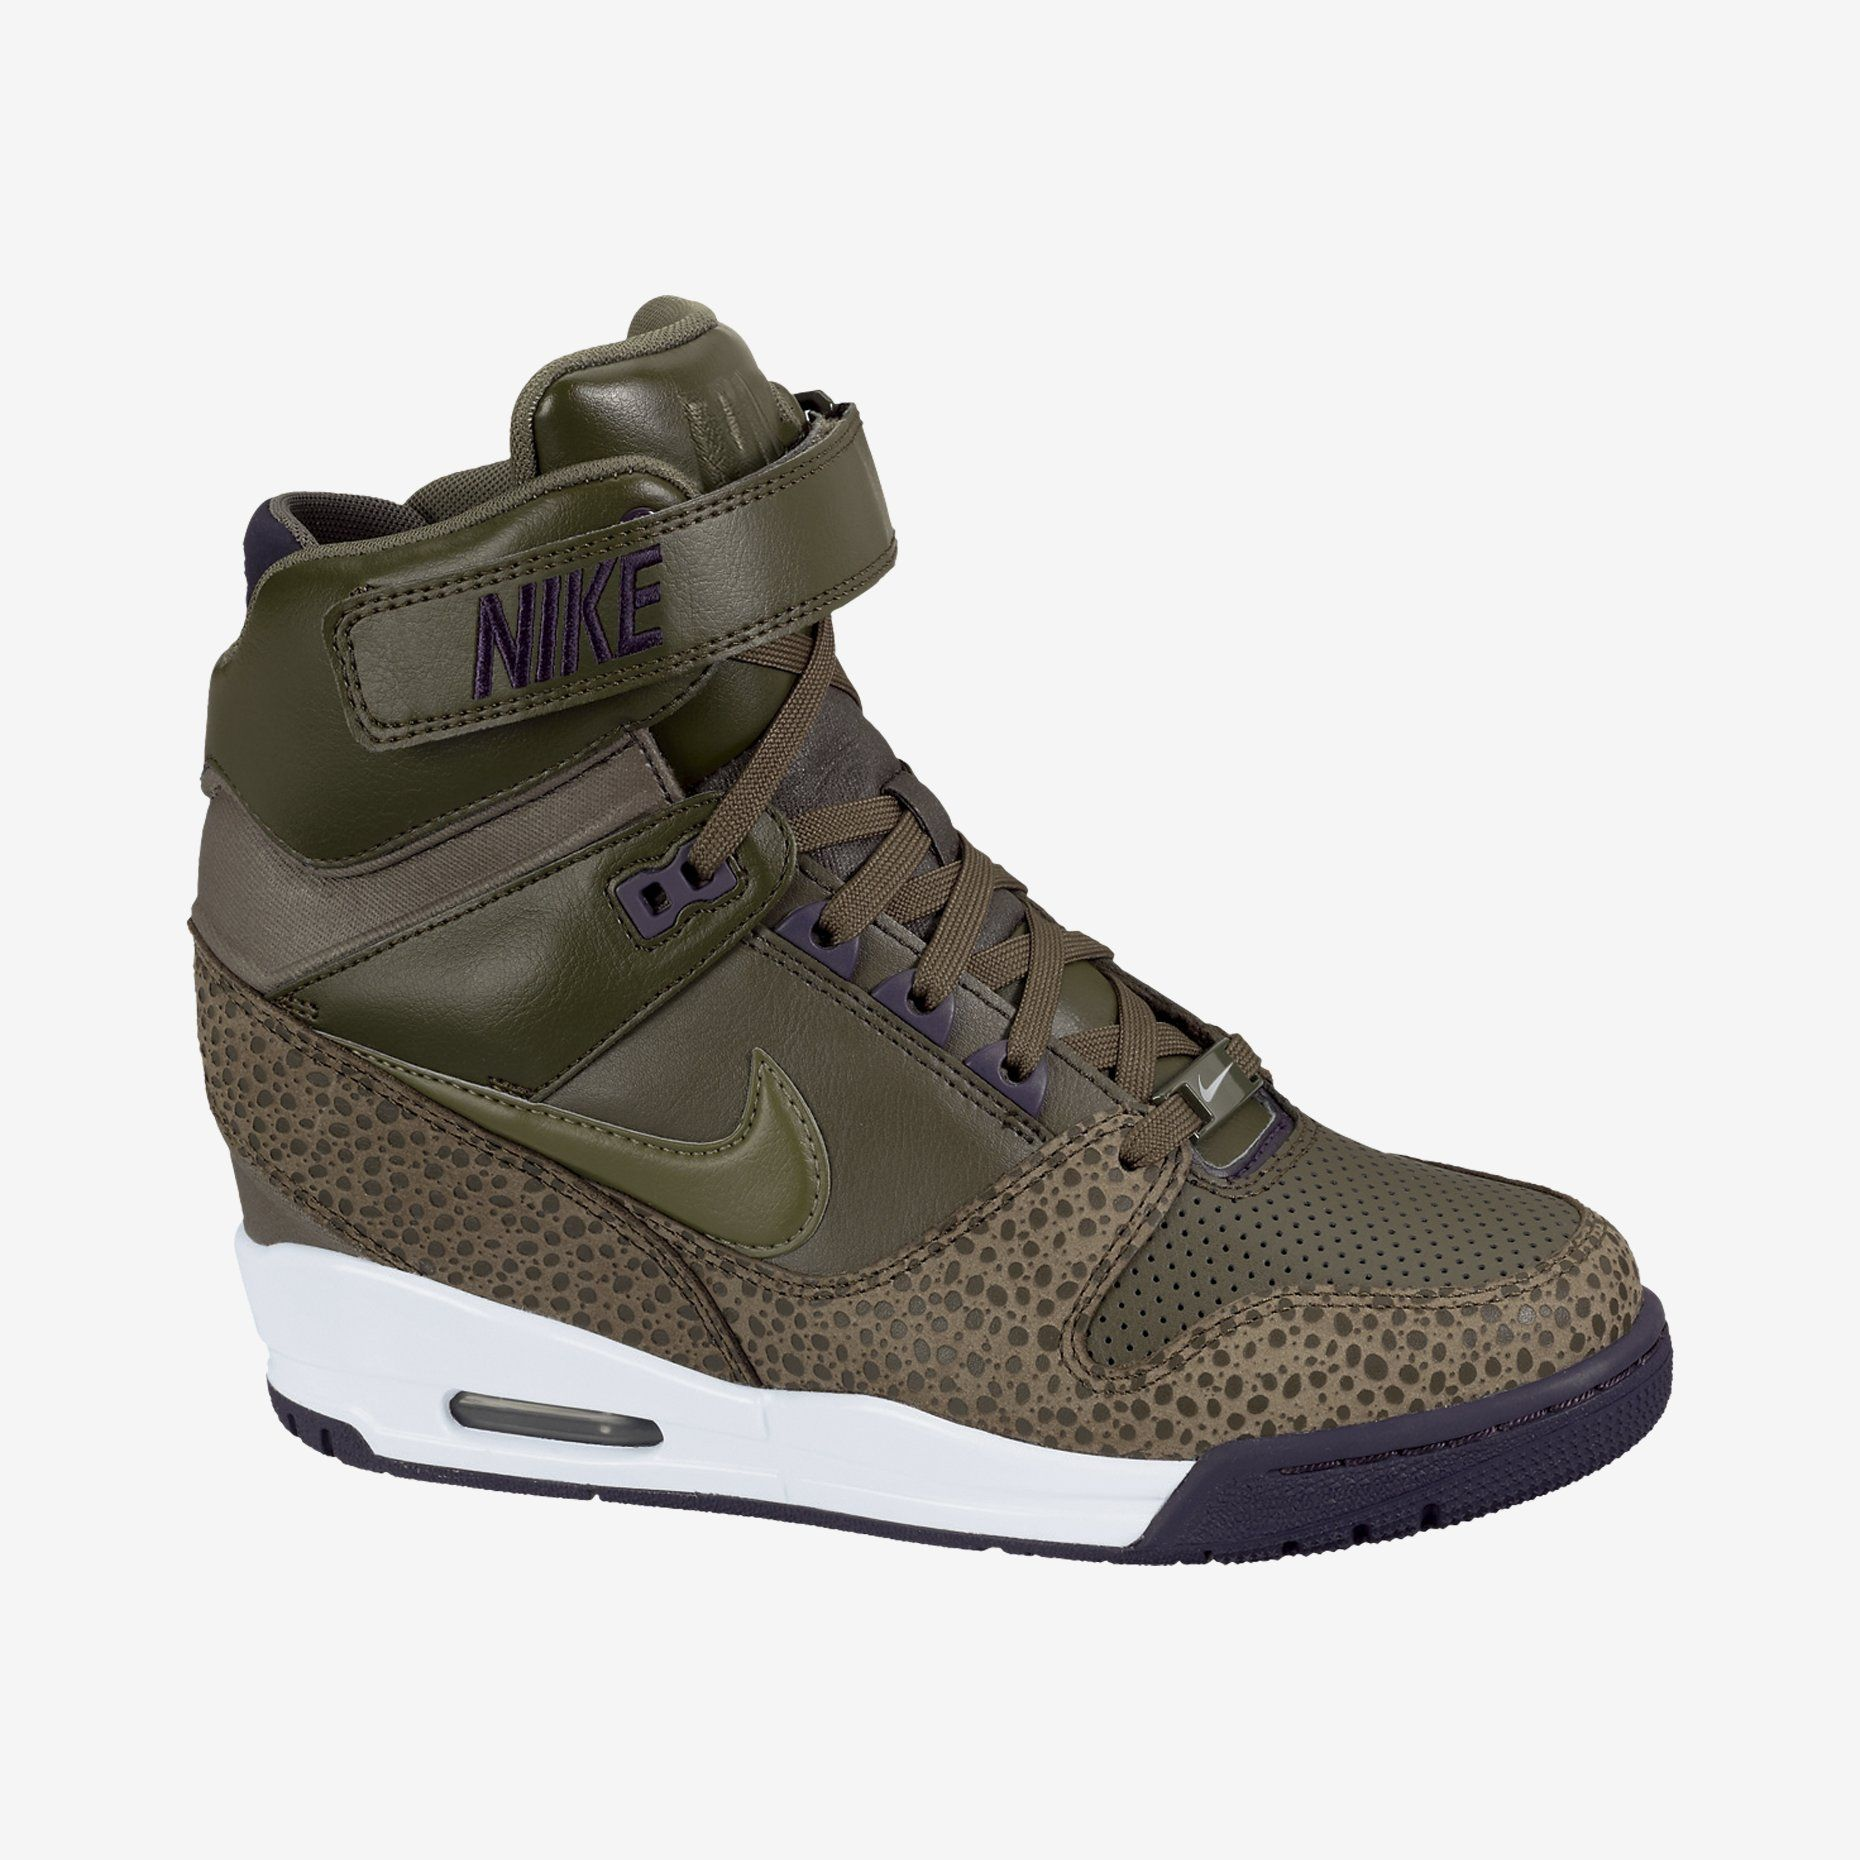 Nike Air Revolution Sky Hi Damen Keilabsatz Schuhe Sneakers